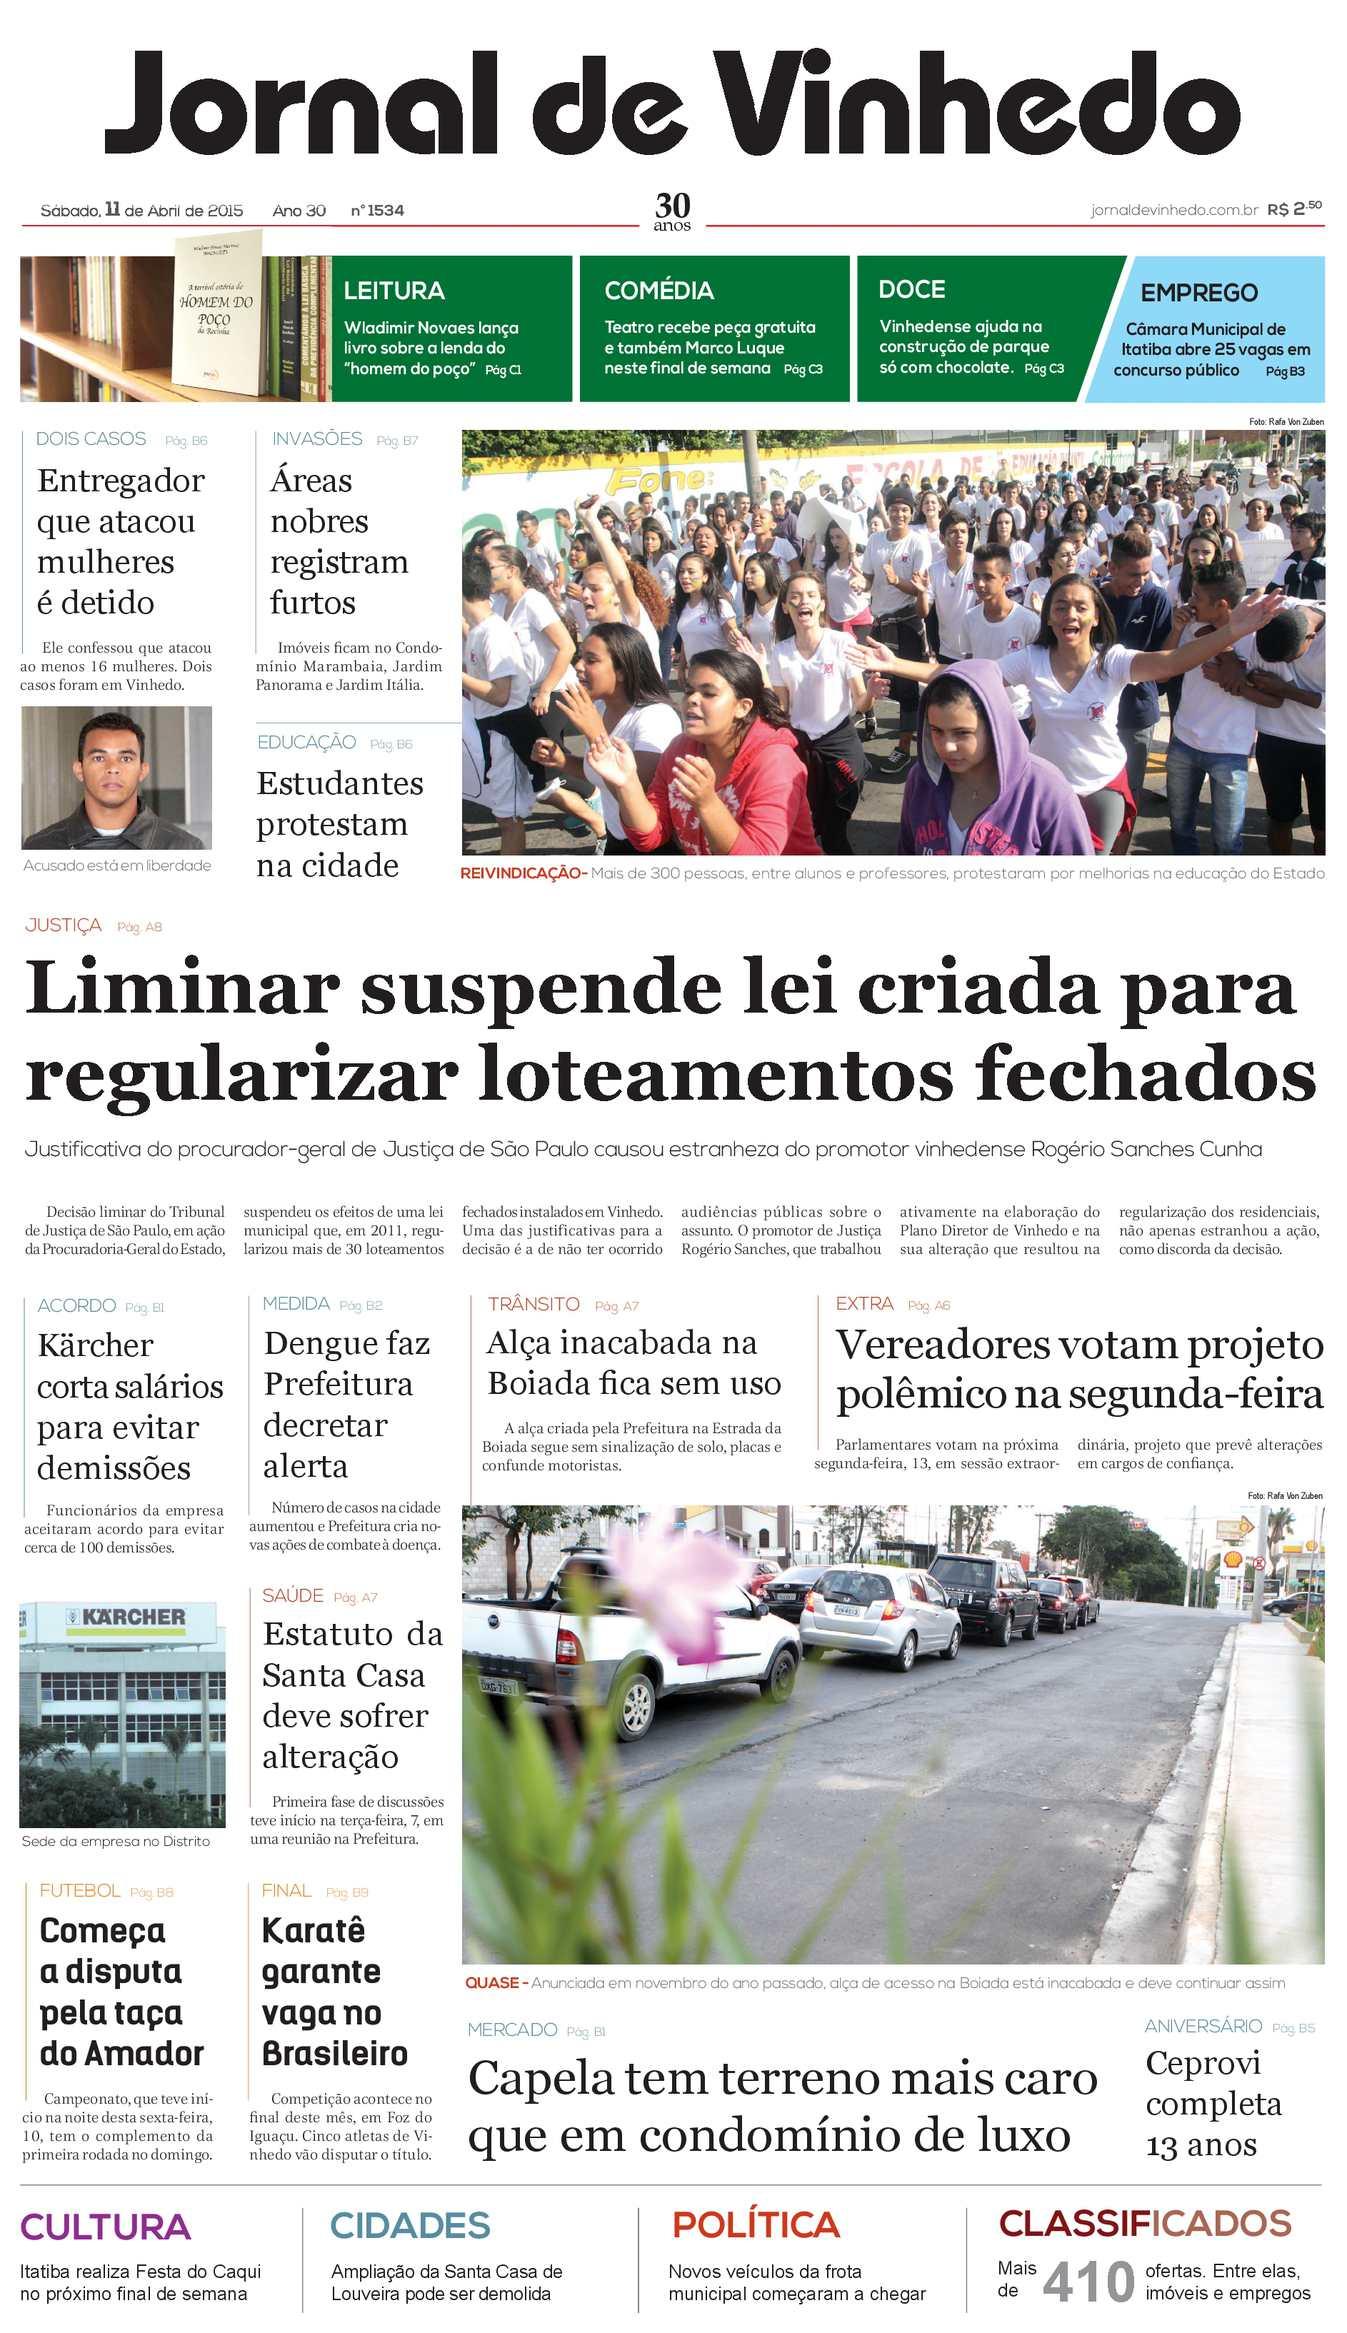 afb0996a37d0d Calaméo - Jornal De Vinhedo Sábado, 11 De Abril De 2015 Edic 1534